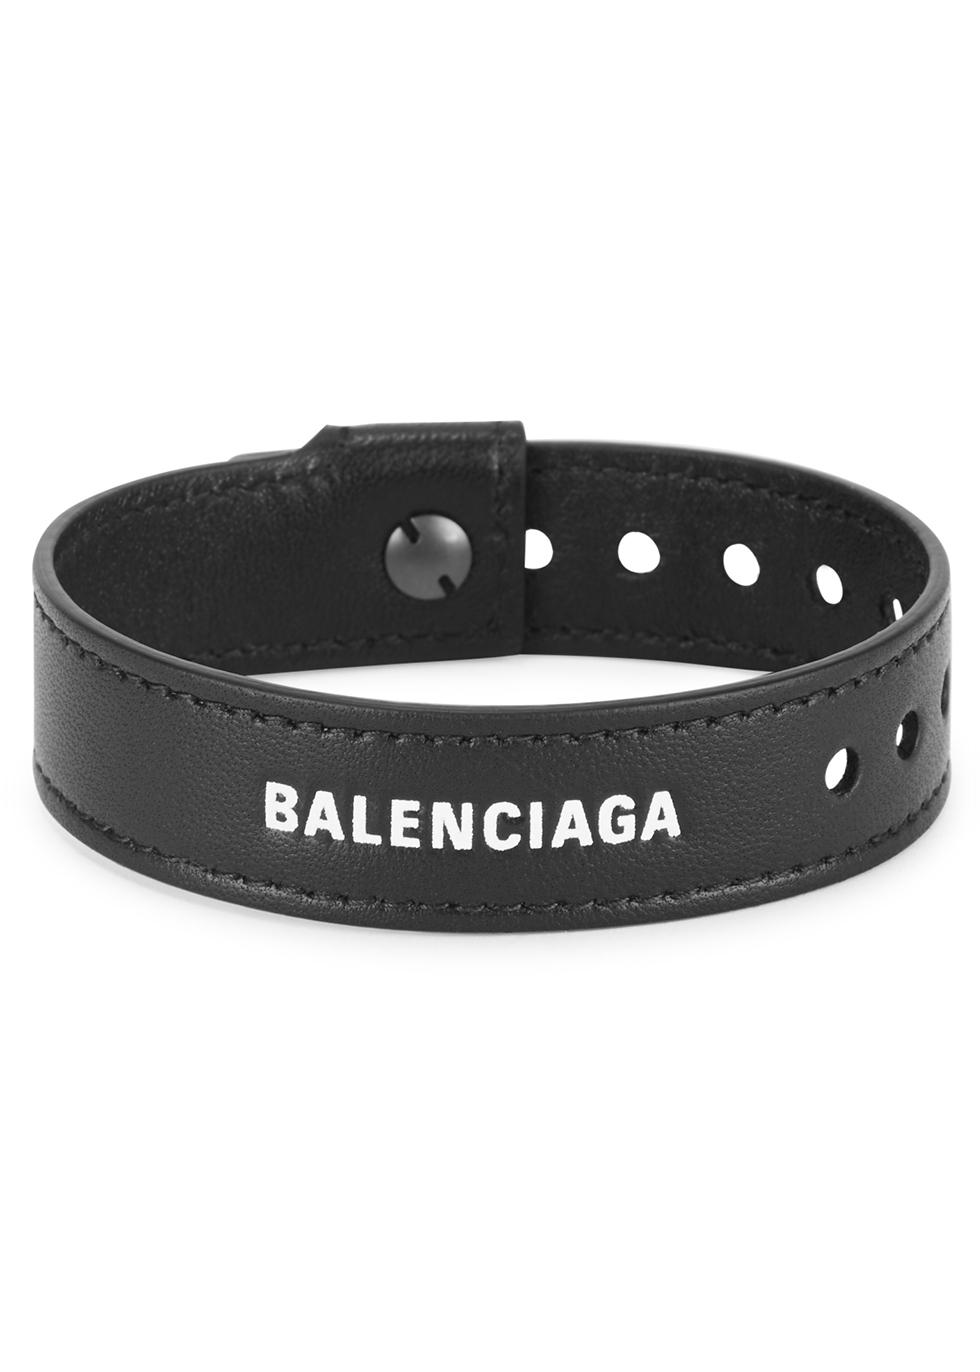 Black logo leather bracelet - Balenciaga